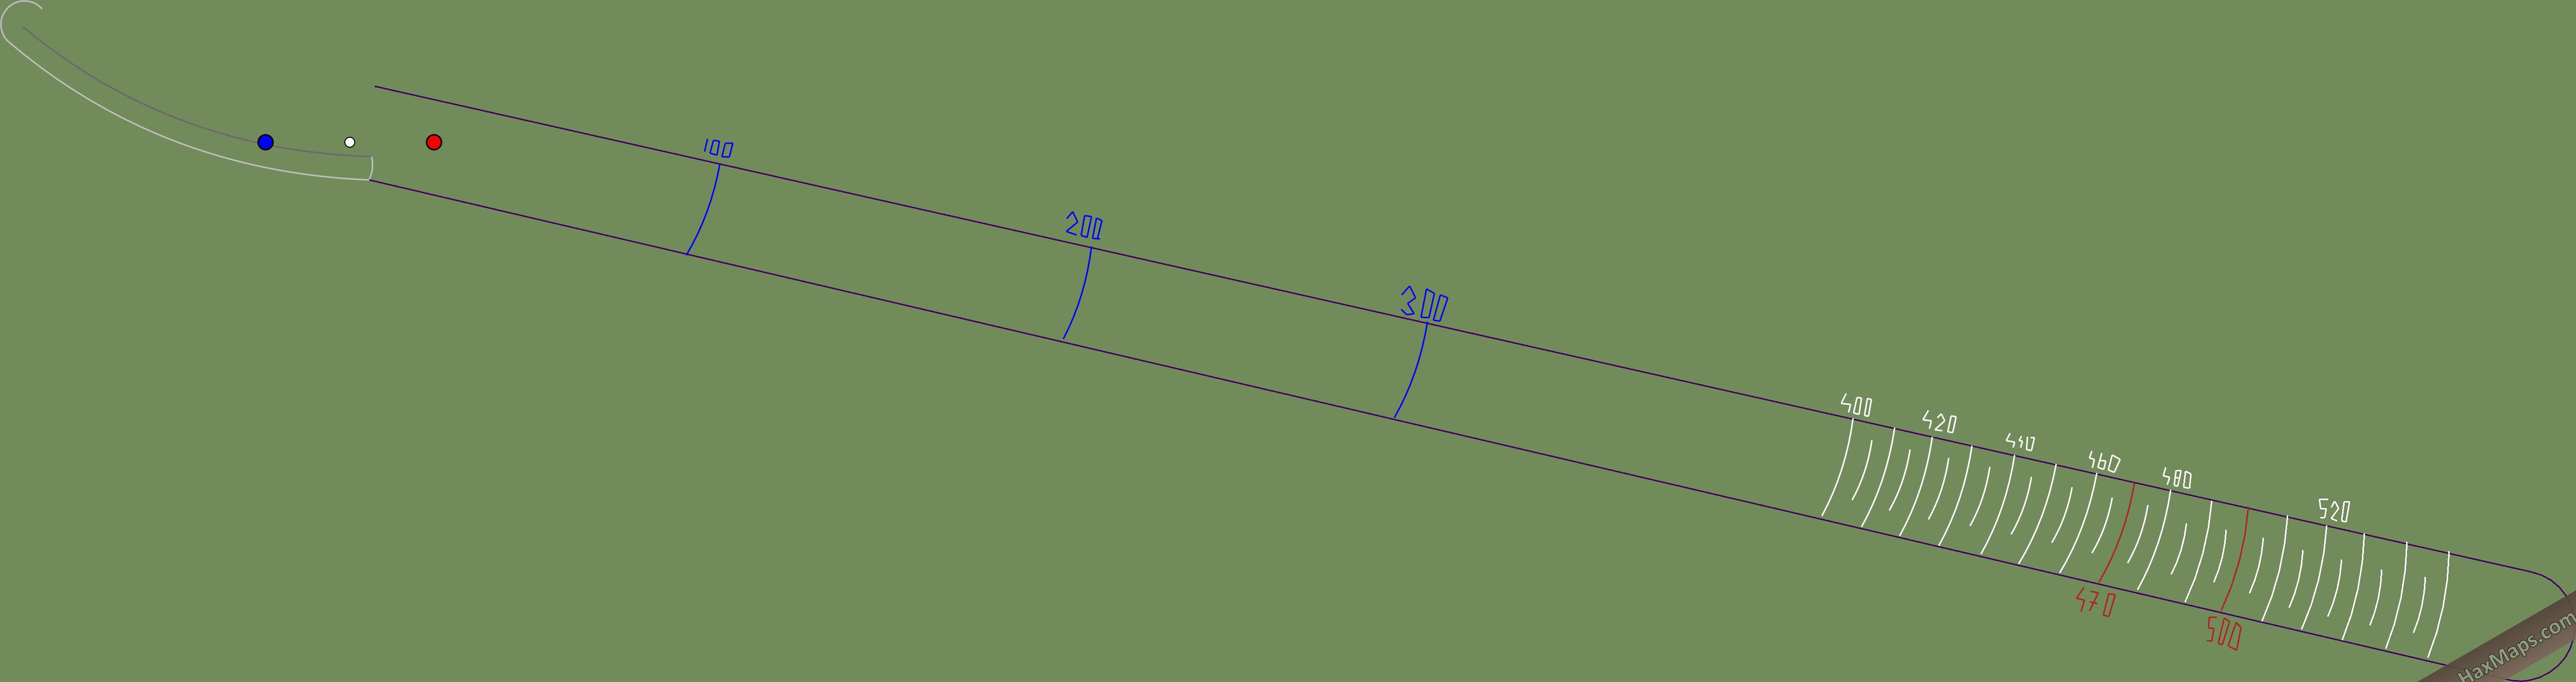 hax ball maps   Skocznia im Wysp S v_1